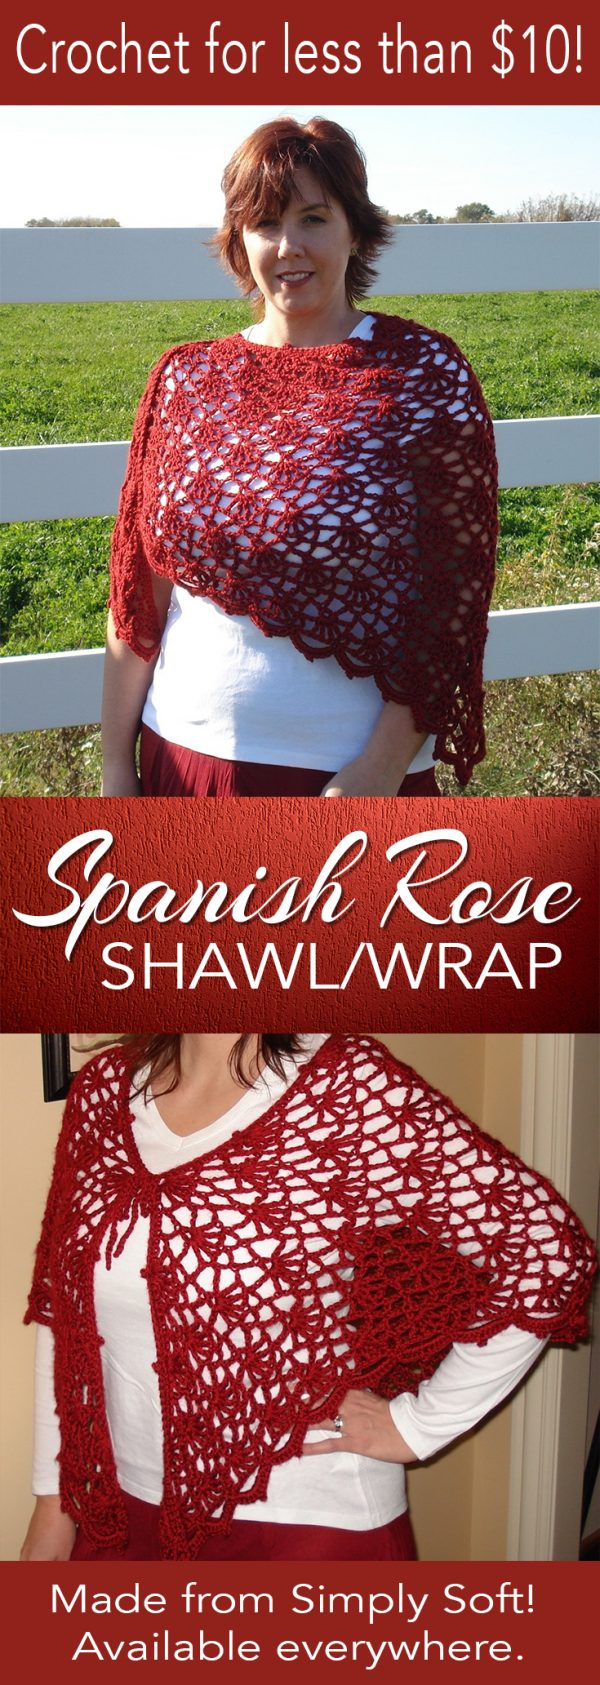 Spanish Rose Shawl / Wrap at Fun Crochet Designs